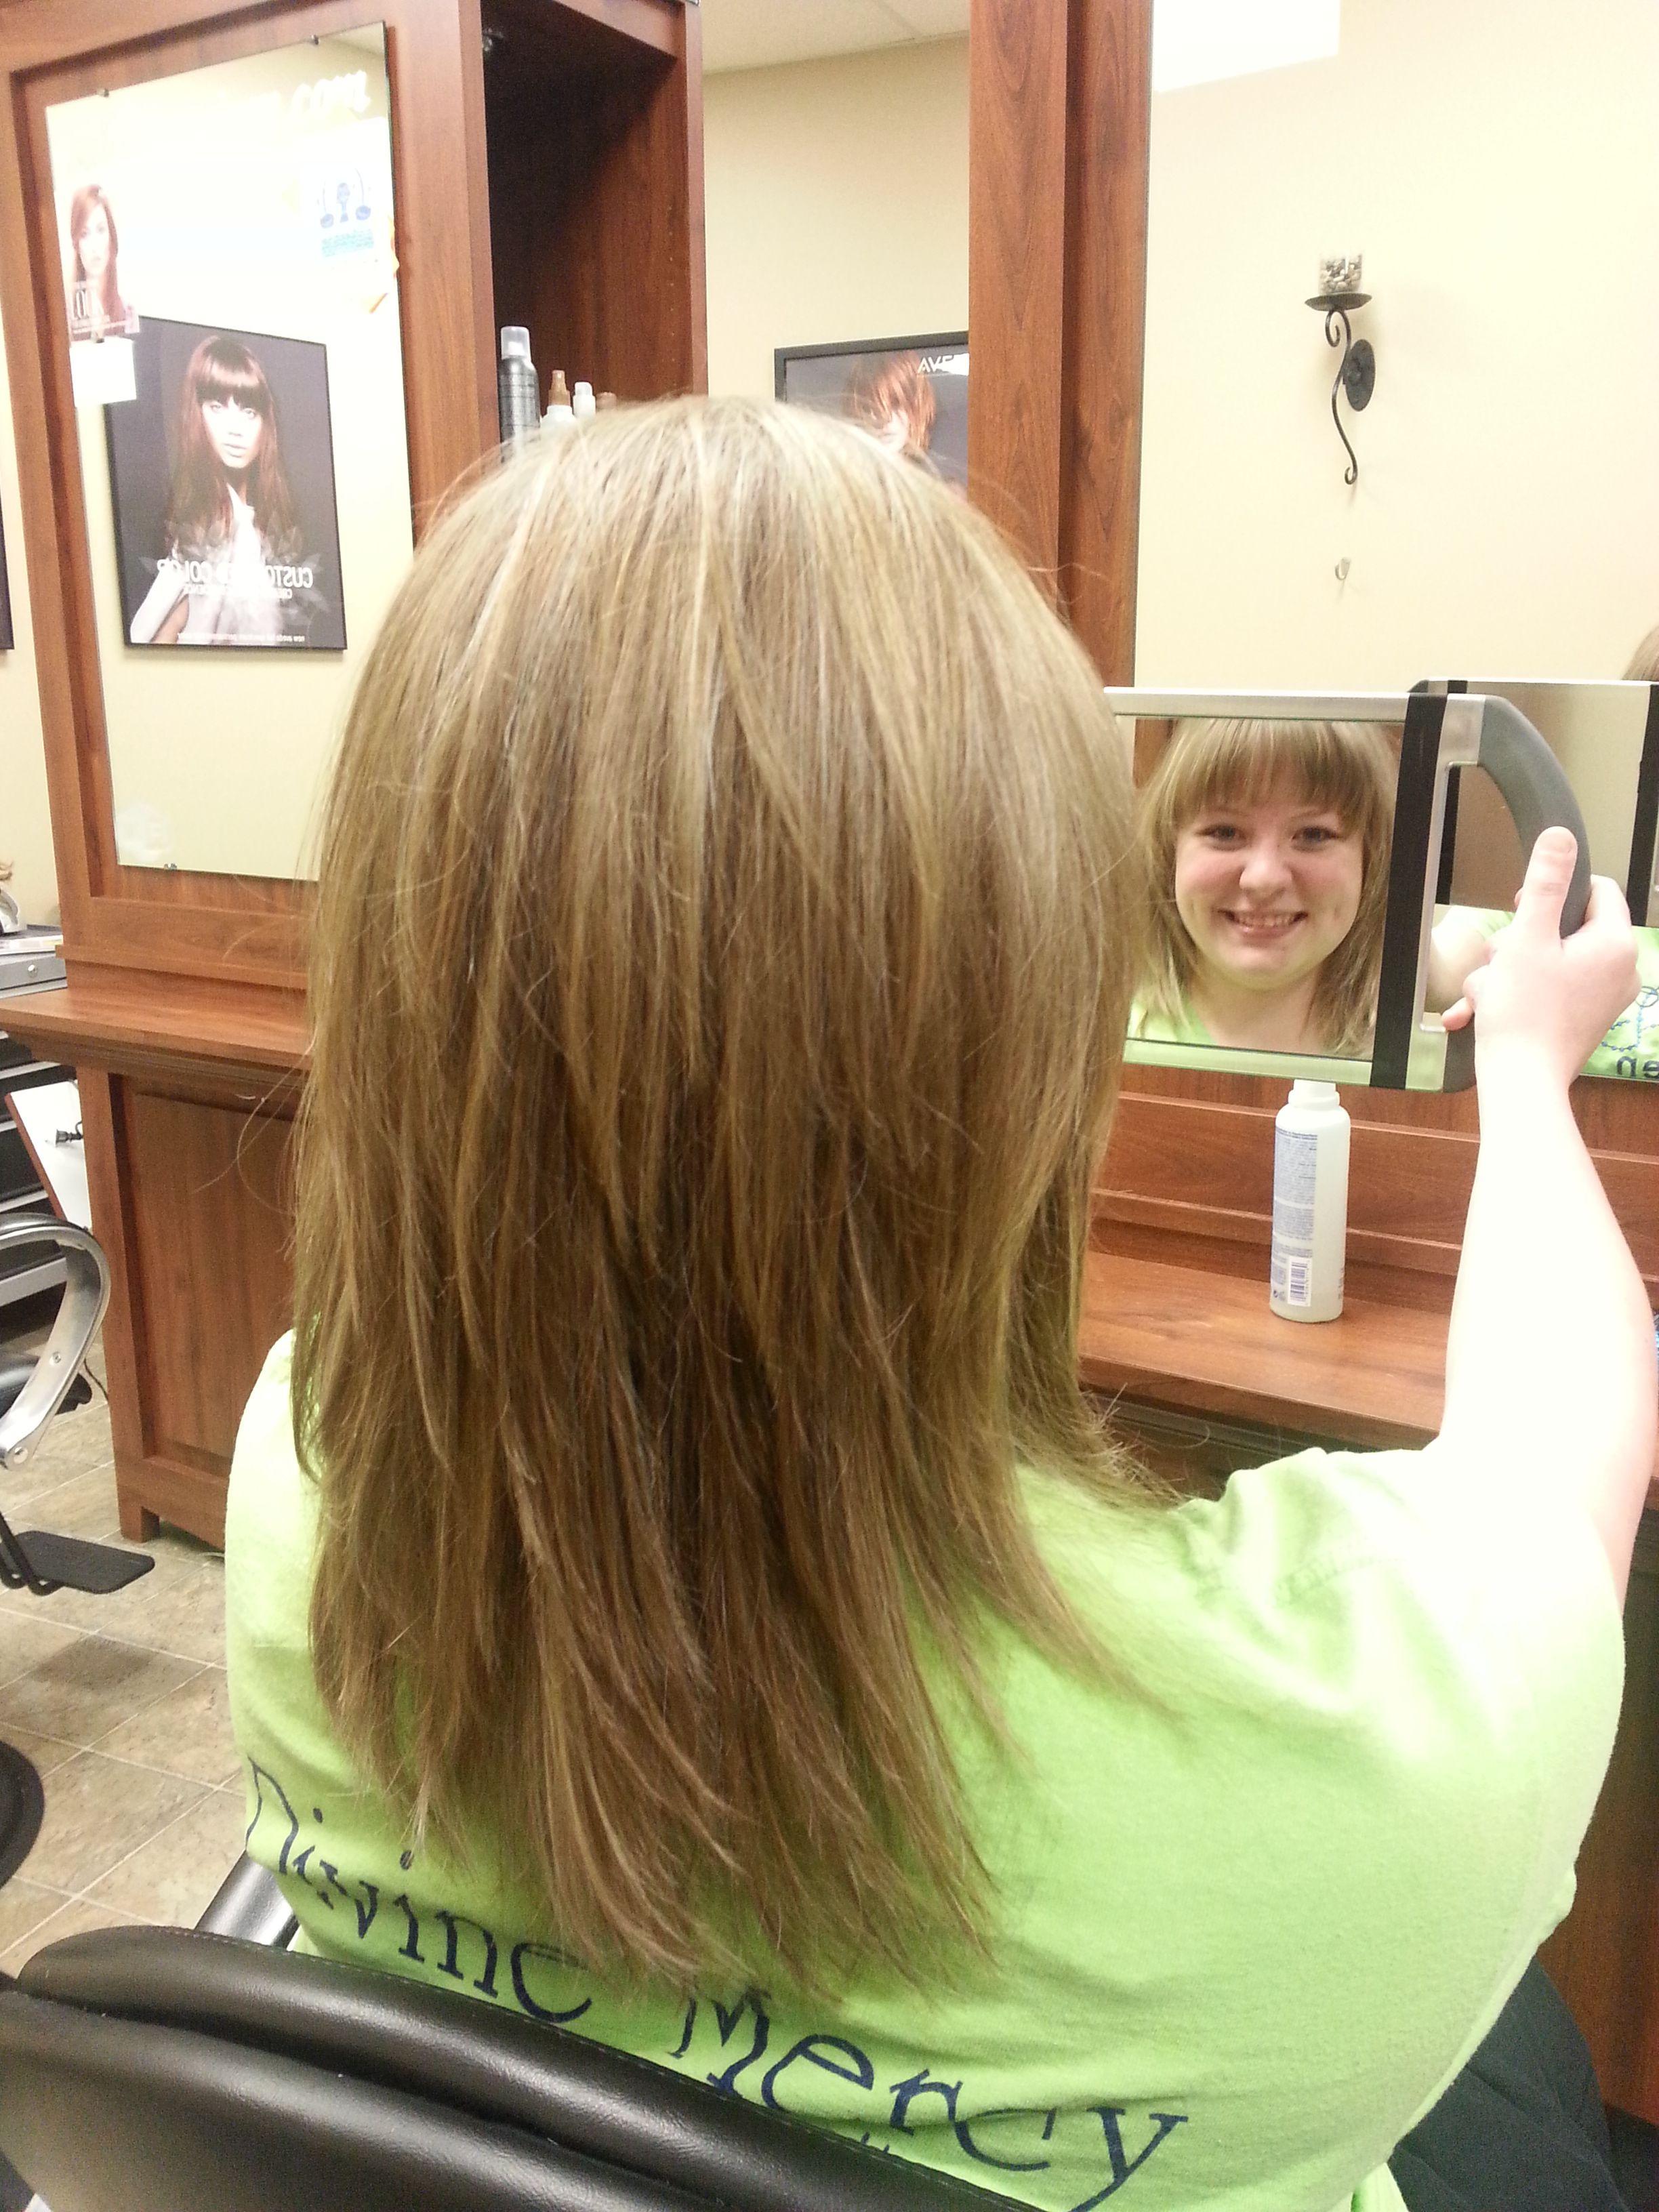 razor haircuts hairstyle | heavy blonde highlights and razor cut